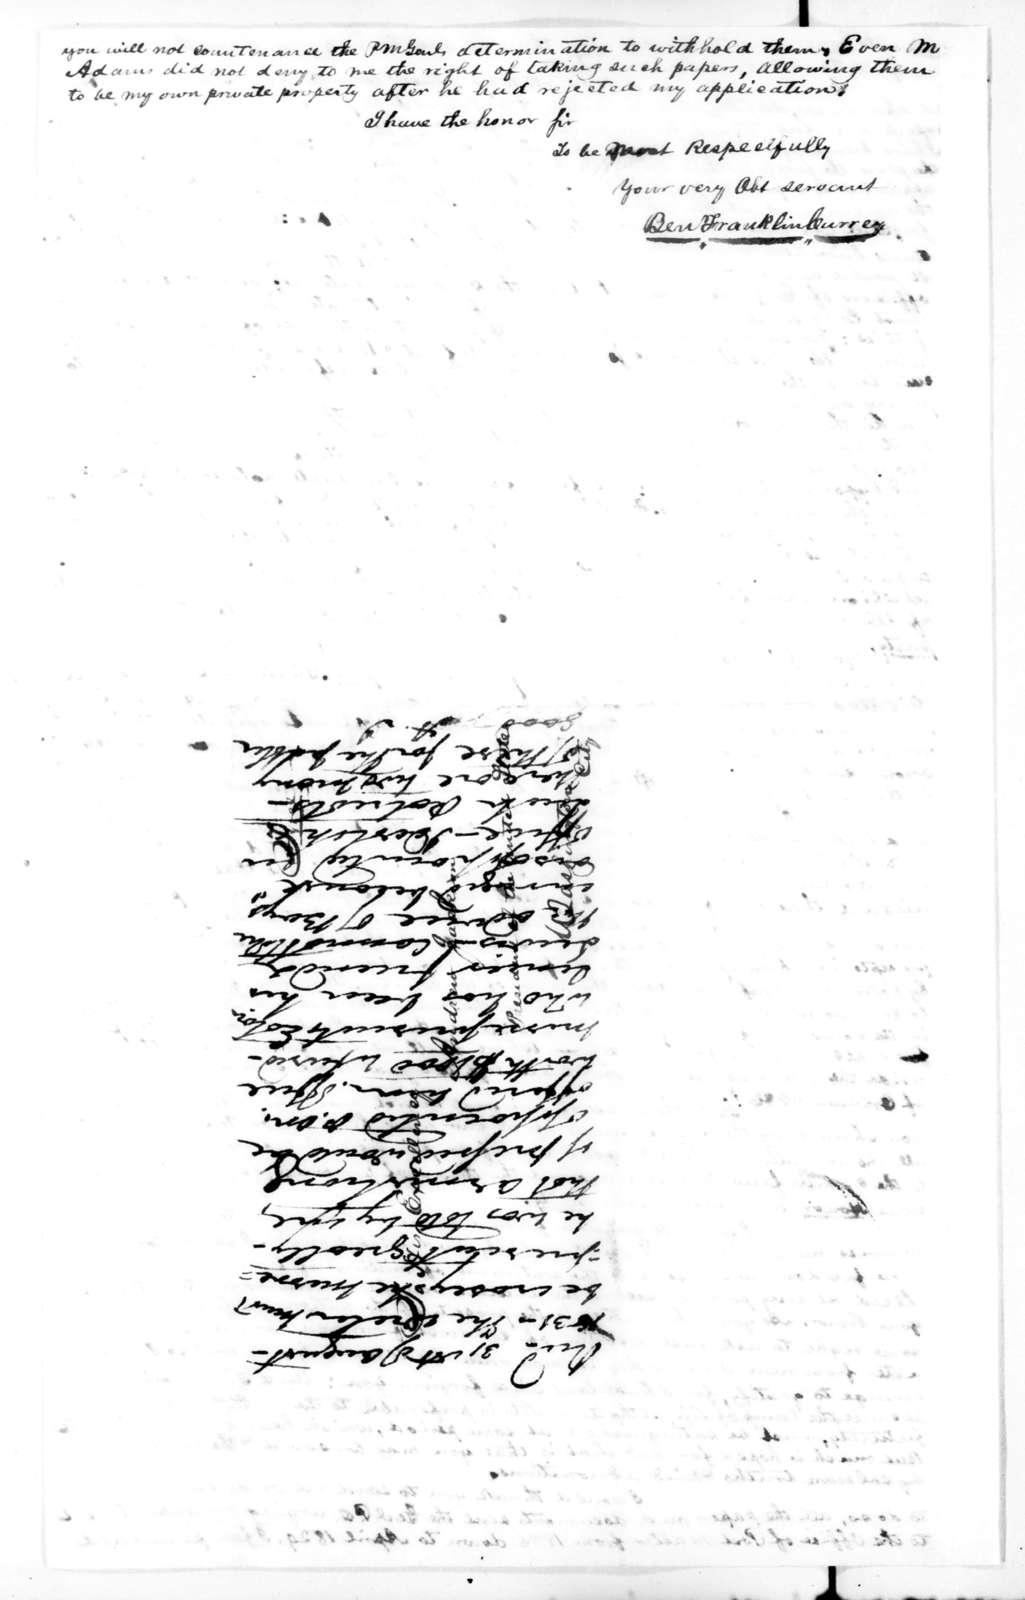 Benjamin Franklin Currey to Andrew Jackson, August 11, 1831